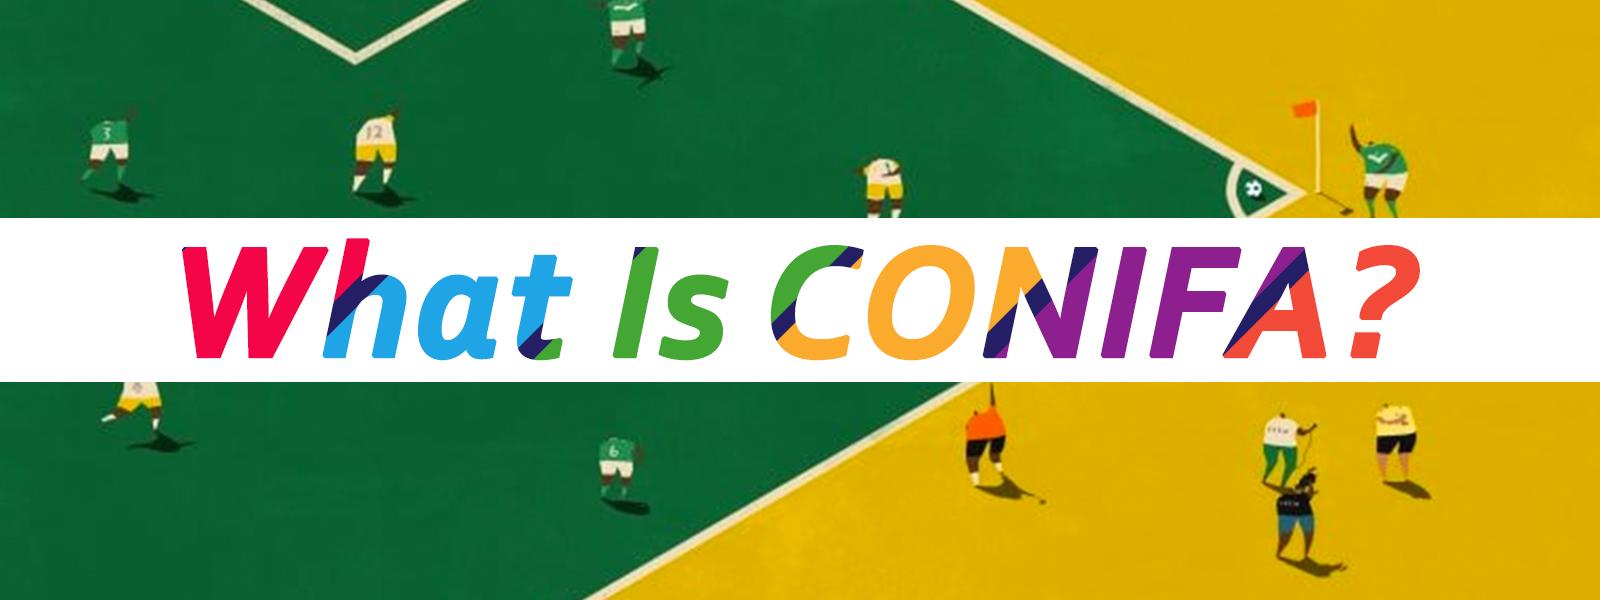 (CONIFA) Confederation of Independent Football Associations